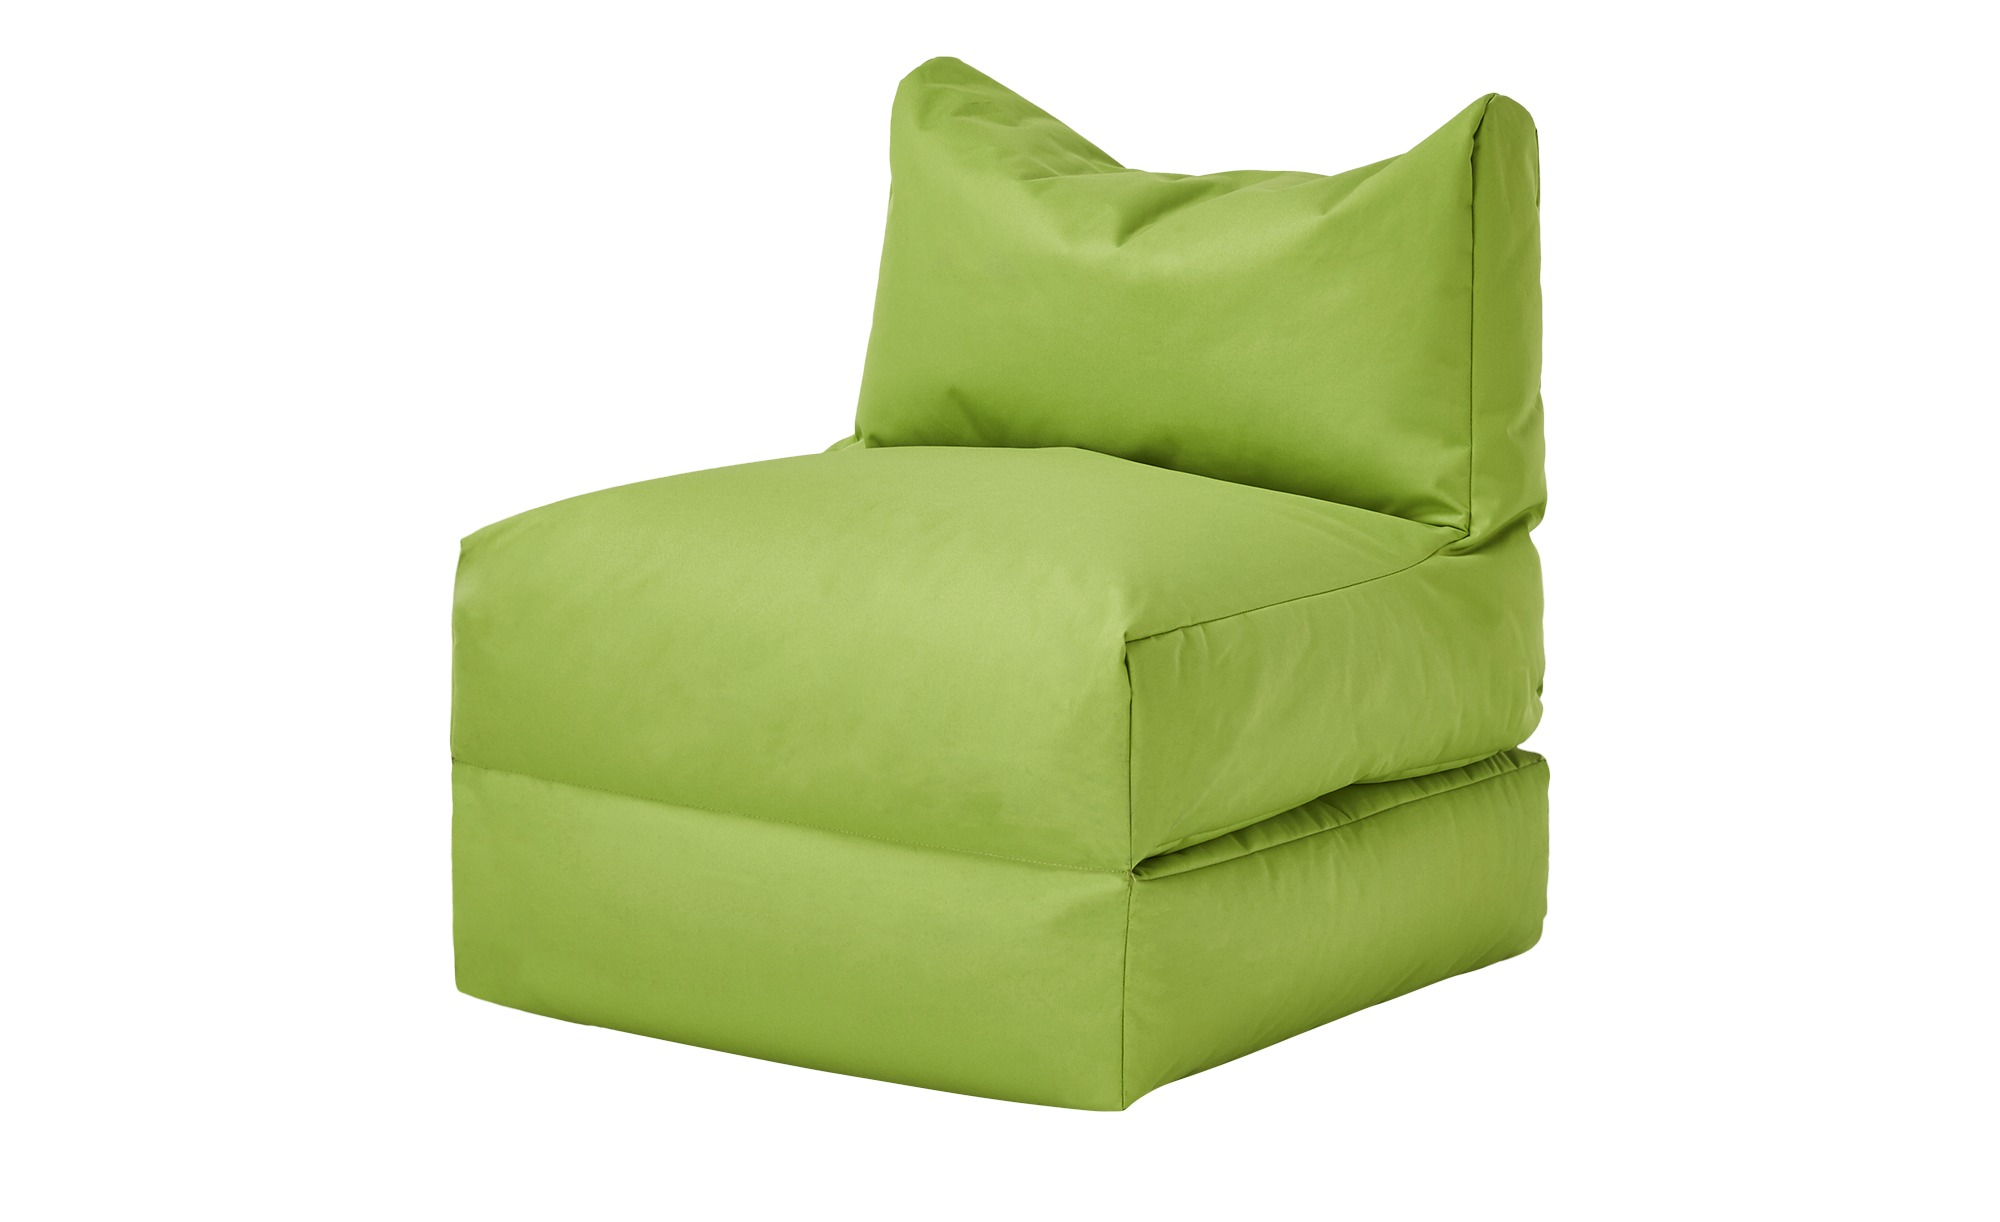 #Sitzsack  Boo ¦ grün ¦ Maße (cm): B: 70 H: 80 T: 80 Polstermöbel > Hocker > Sitzsäcke – Höffner#